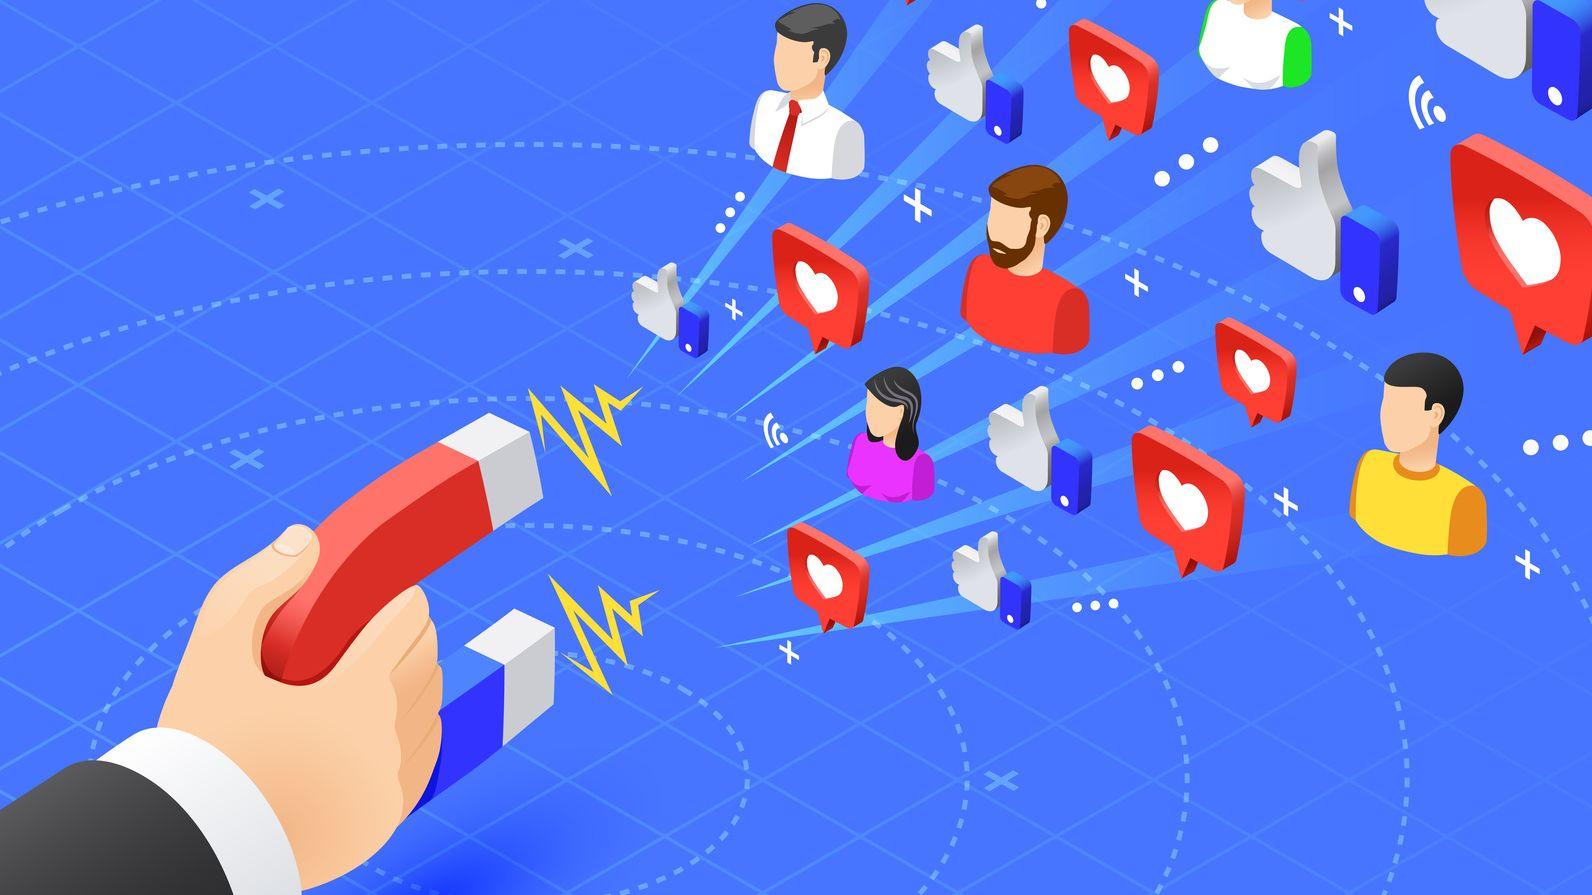 Rakuten-Umfrage: So viel verdienen Influencer pro Post